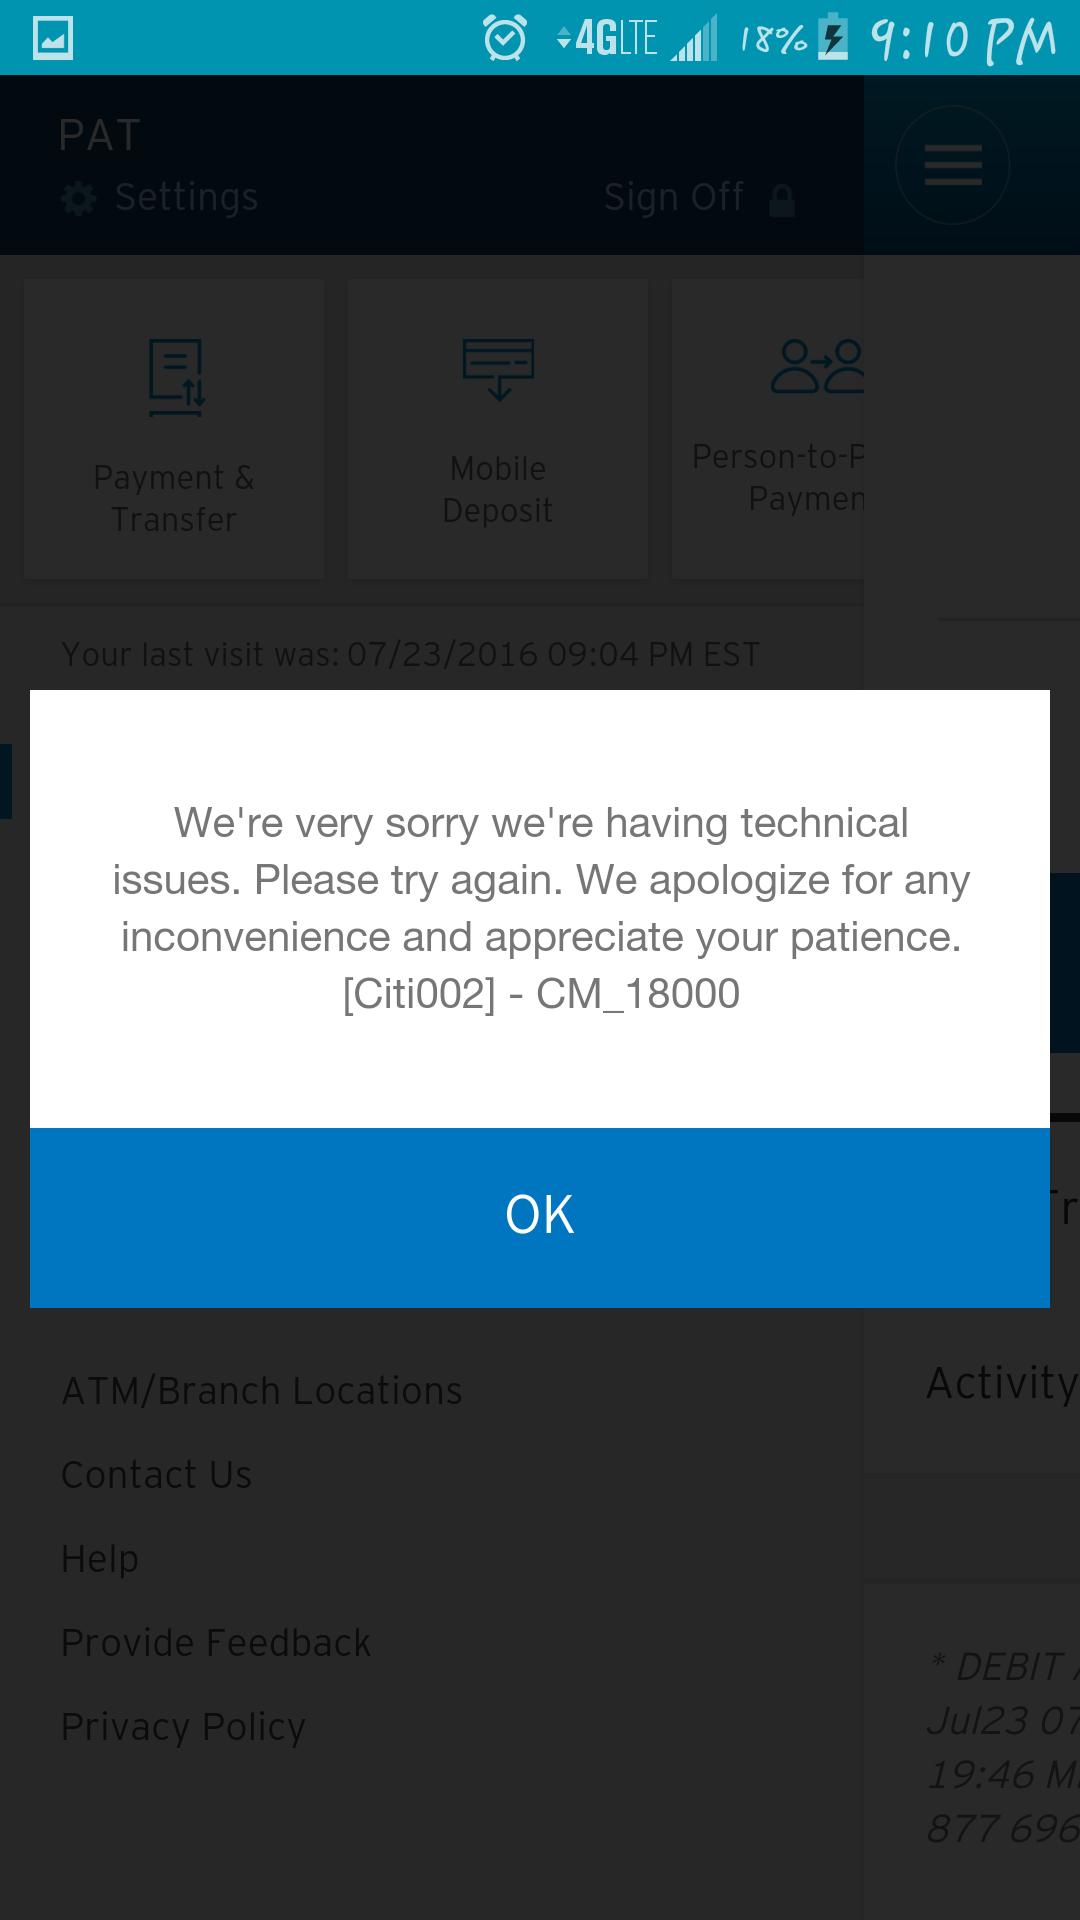 Citibank Customer Service Complaints Department